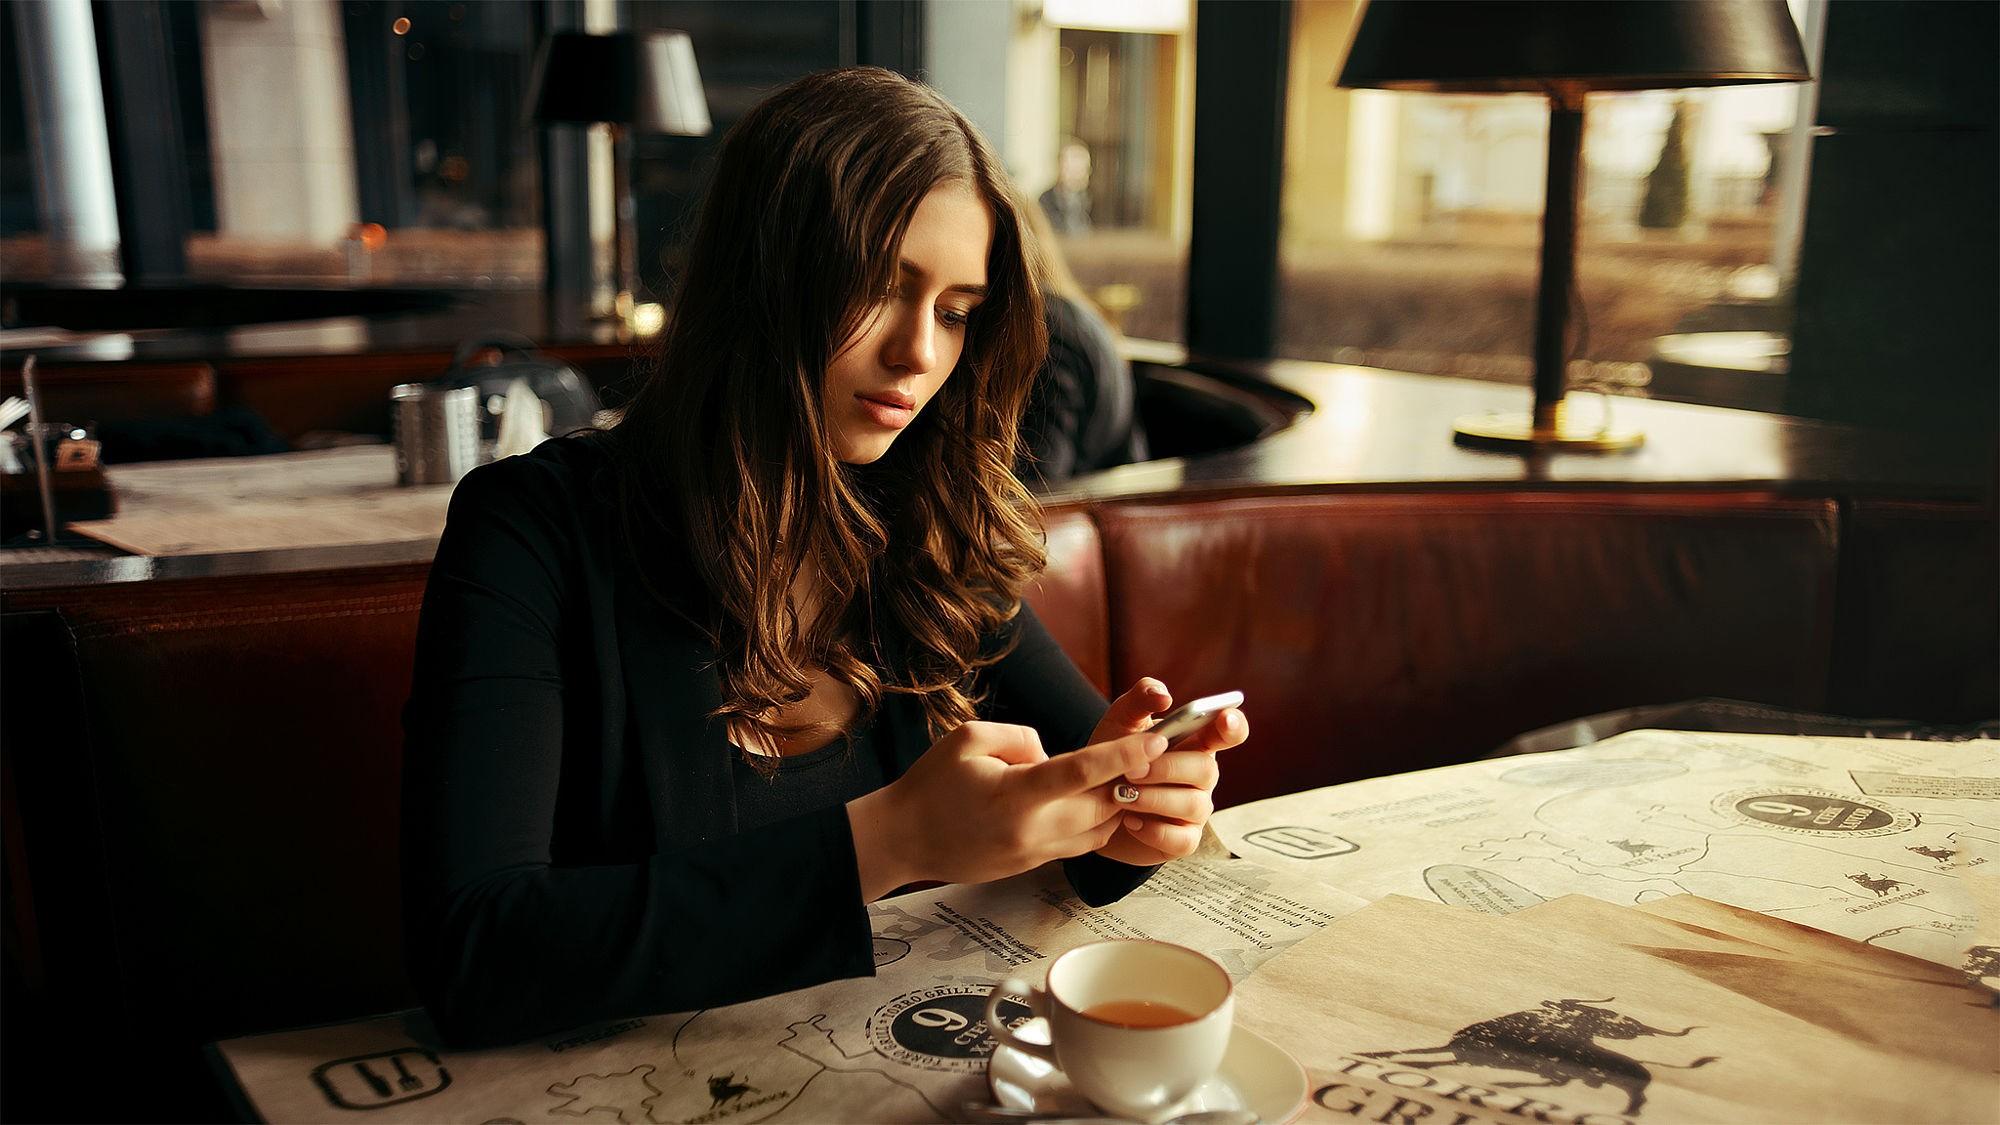 People 2000x1125 coffee women restaurant brunette long hair focused black dress depth of field cafeteria  women indoors